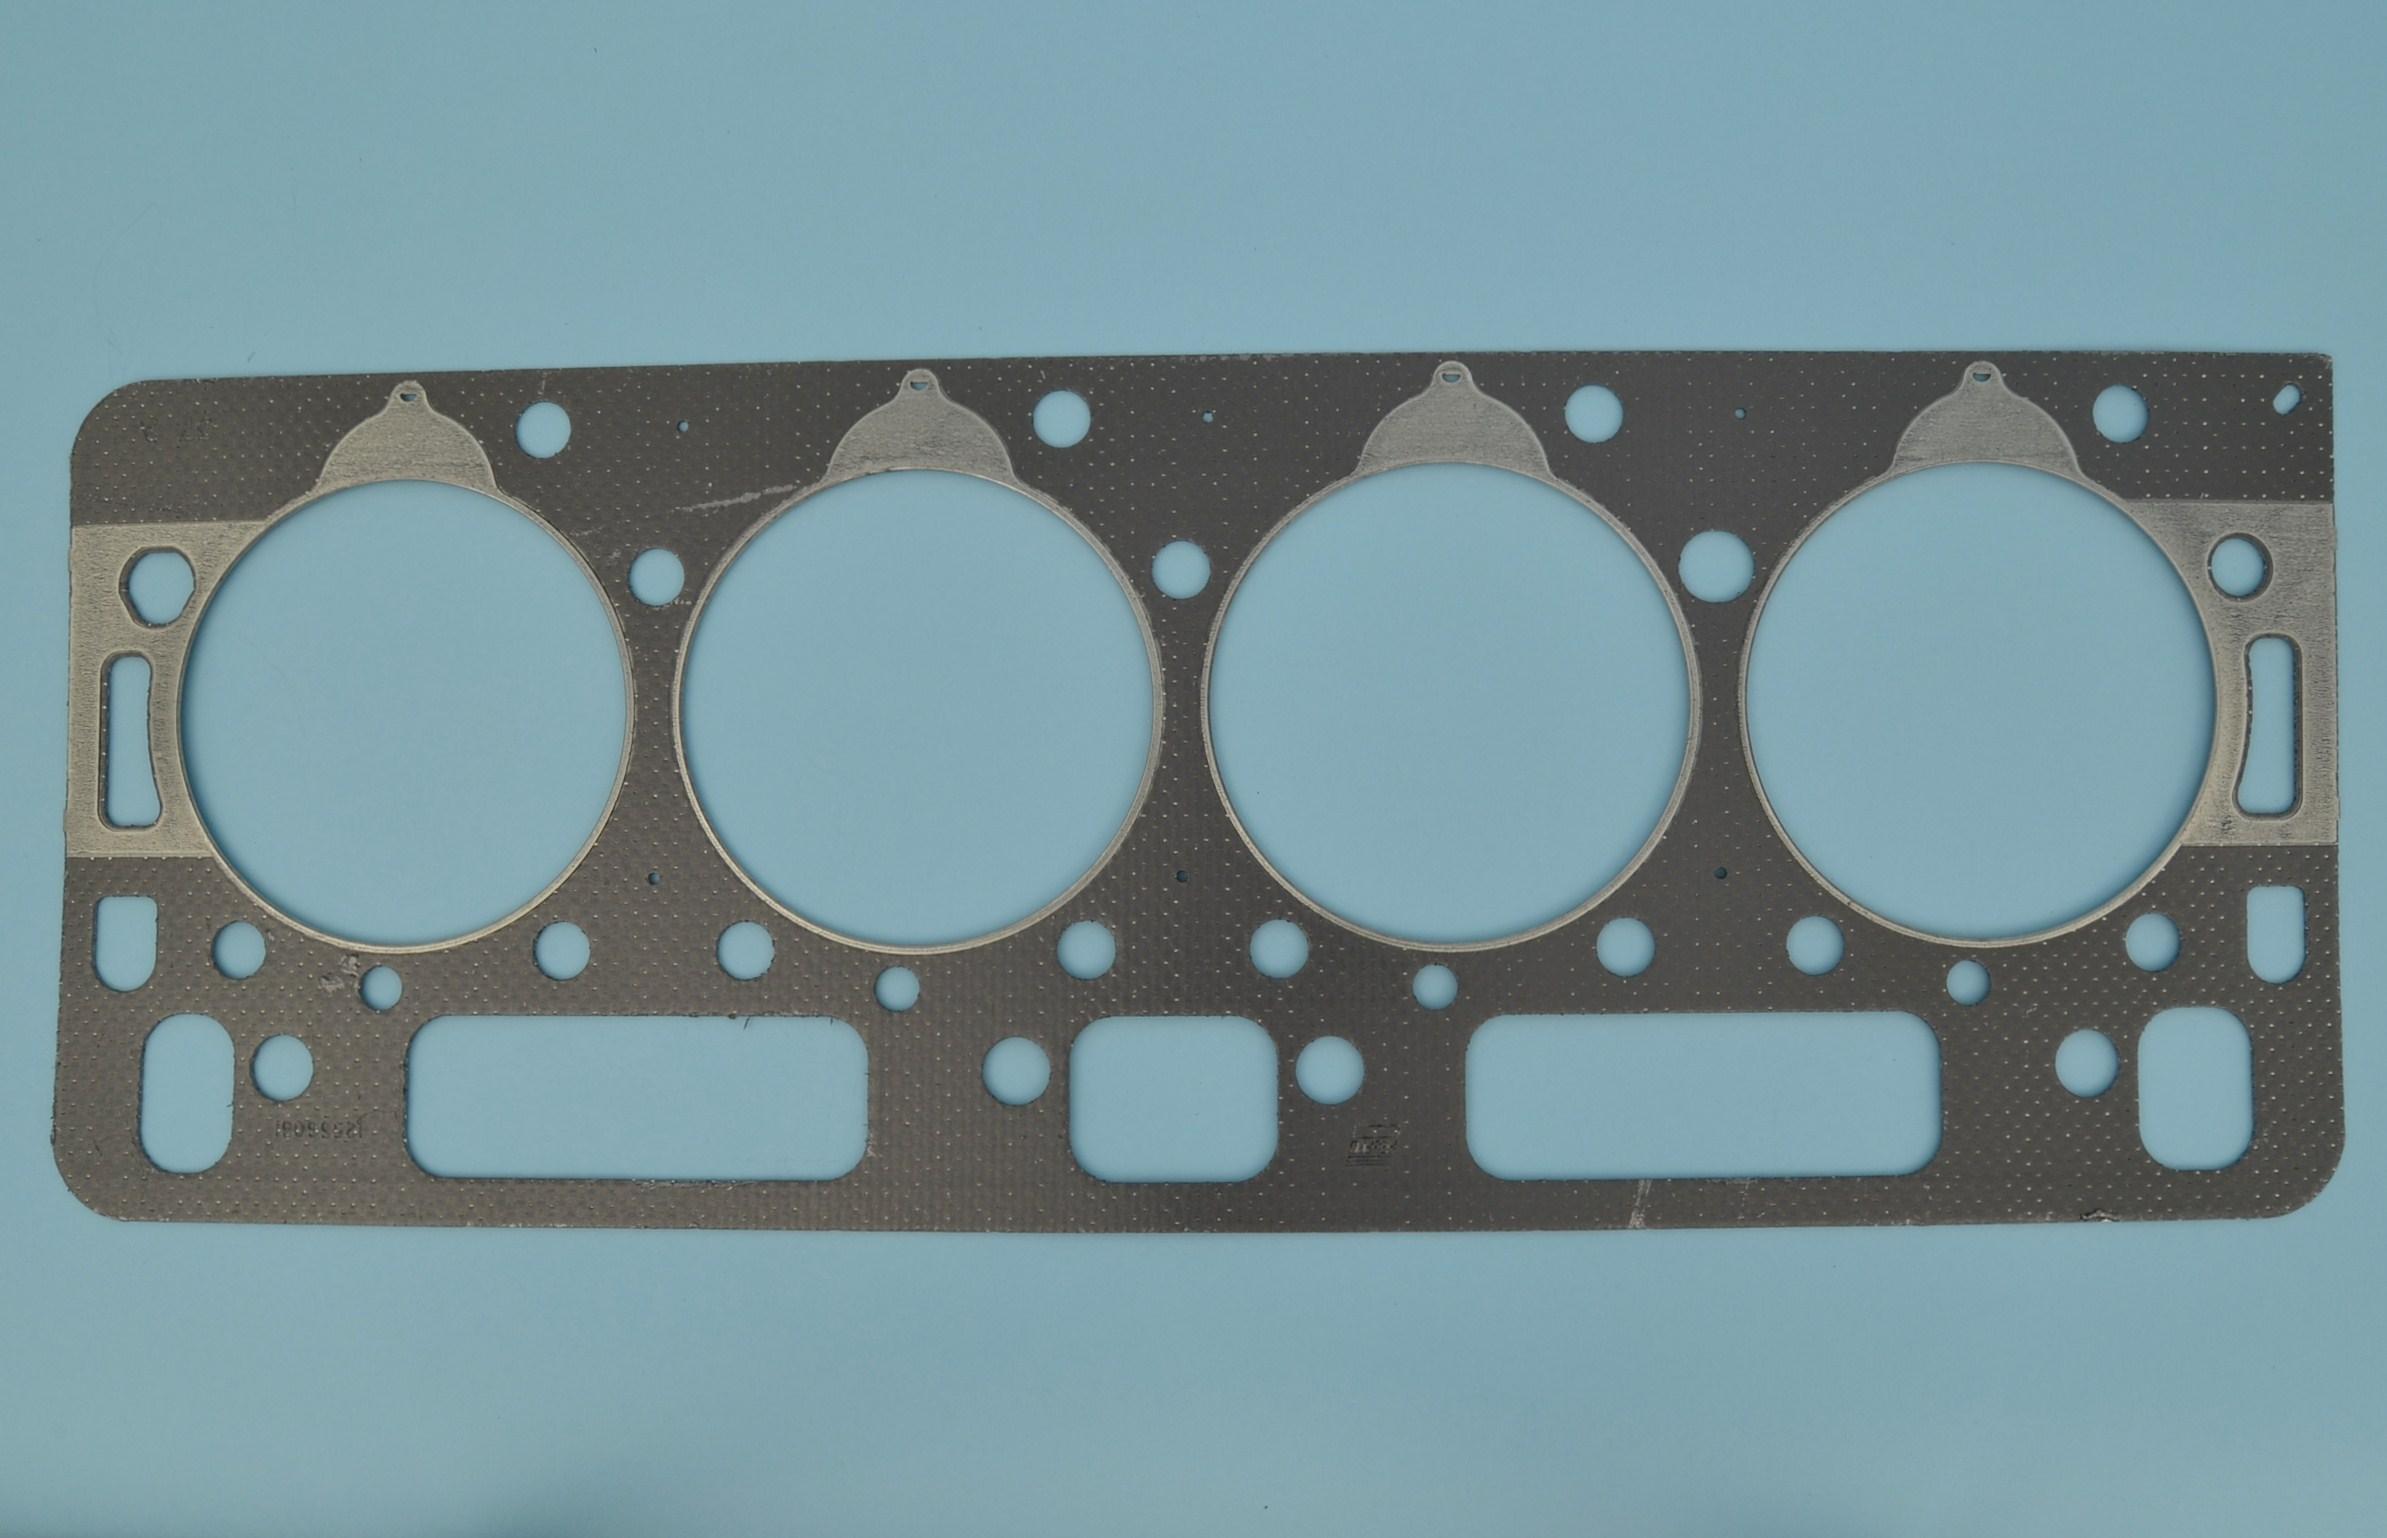 GASKET CYLINDER HEAD 6.5T